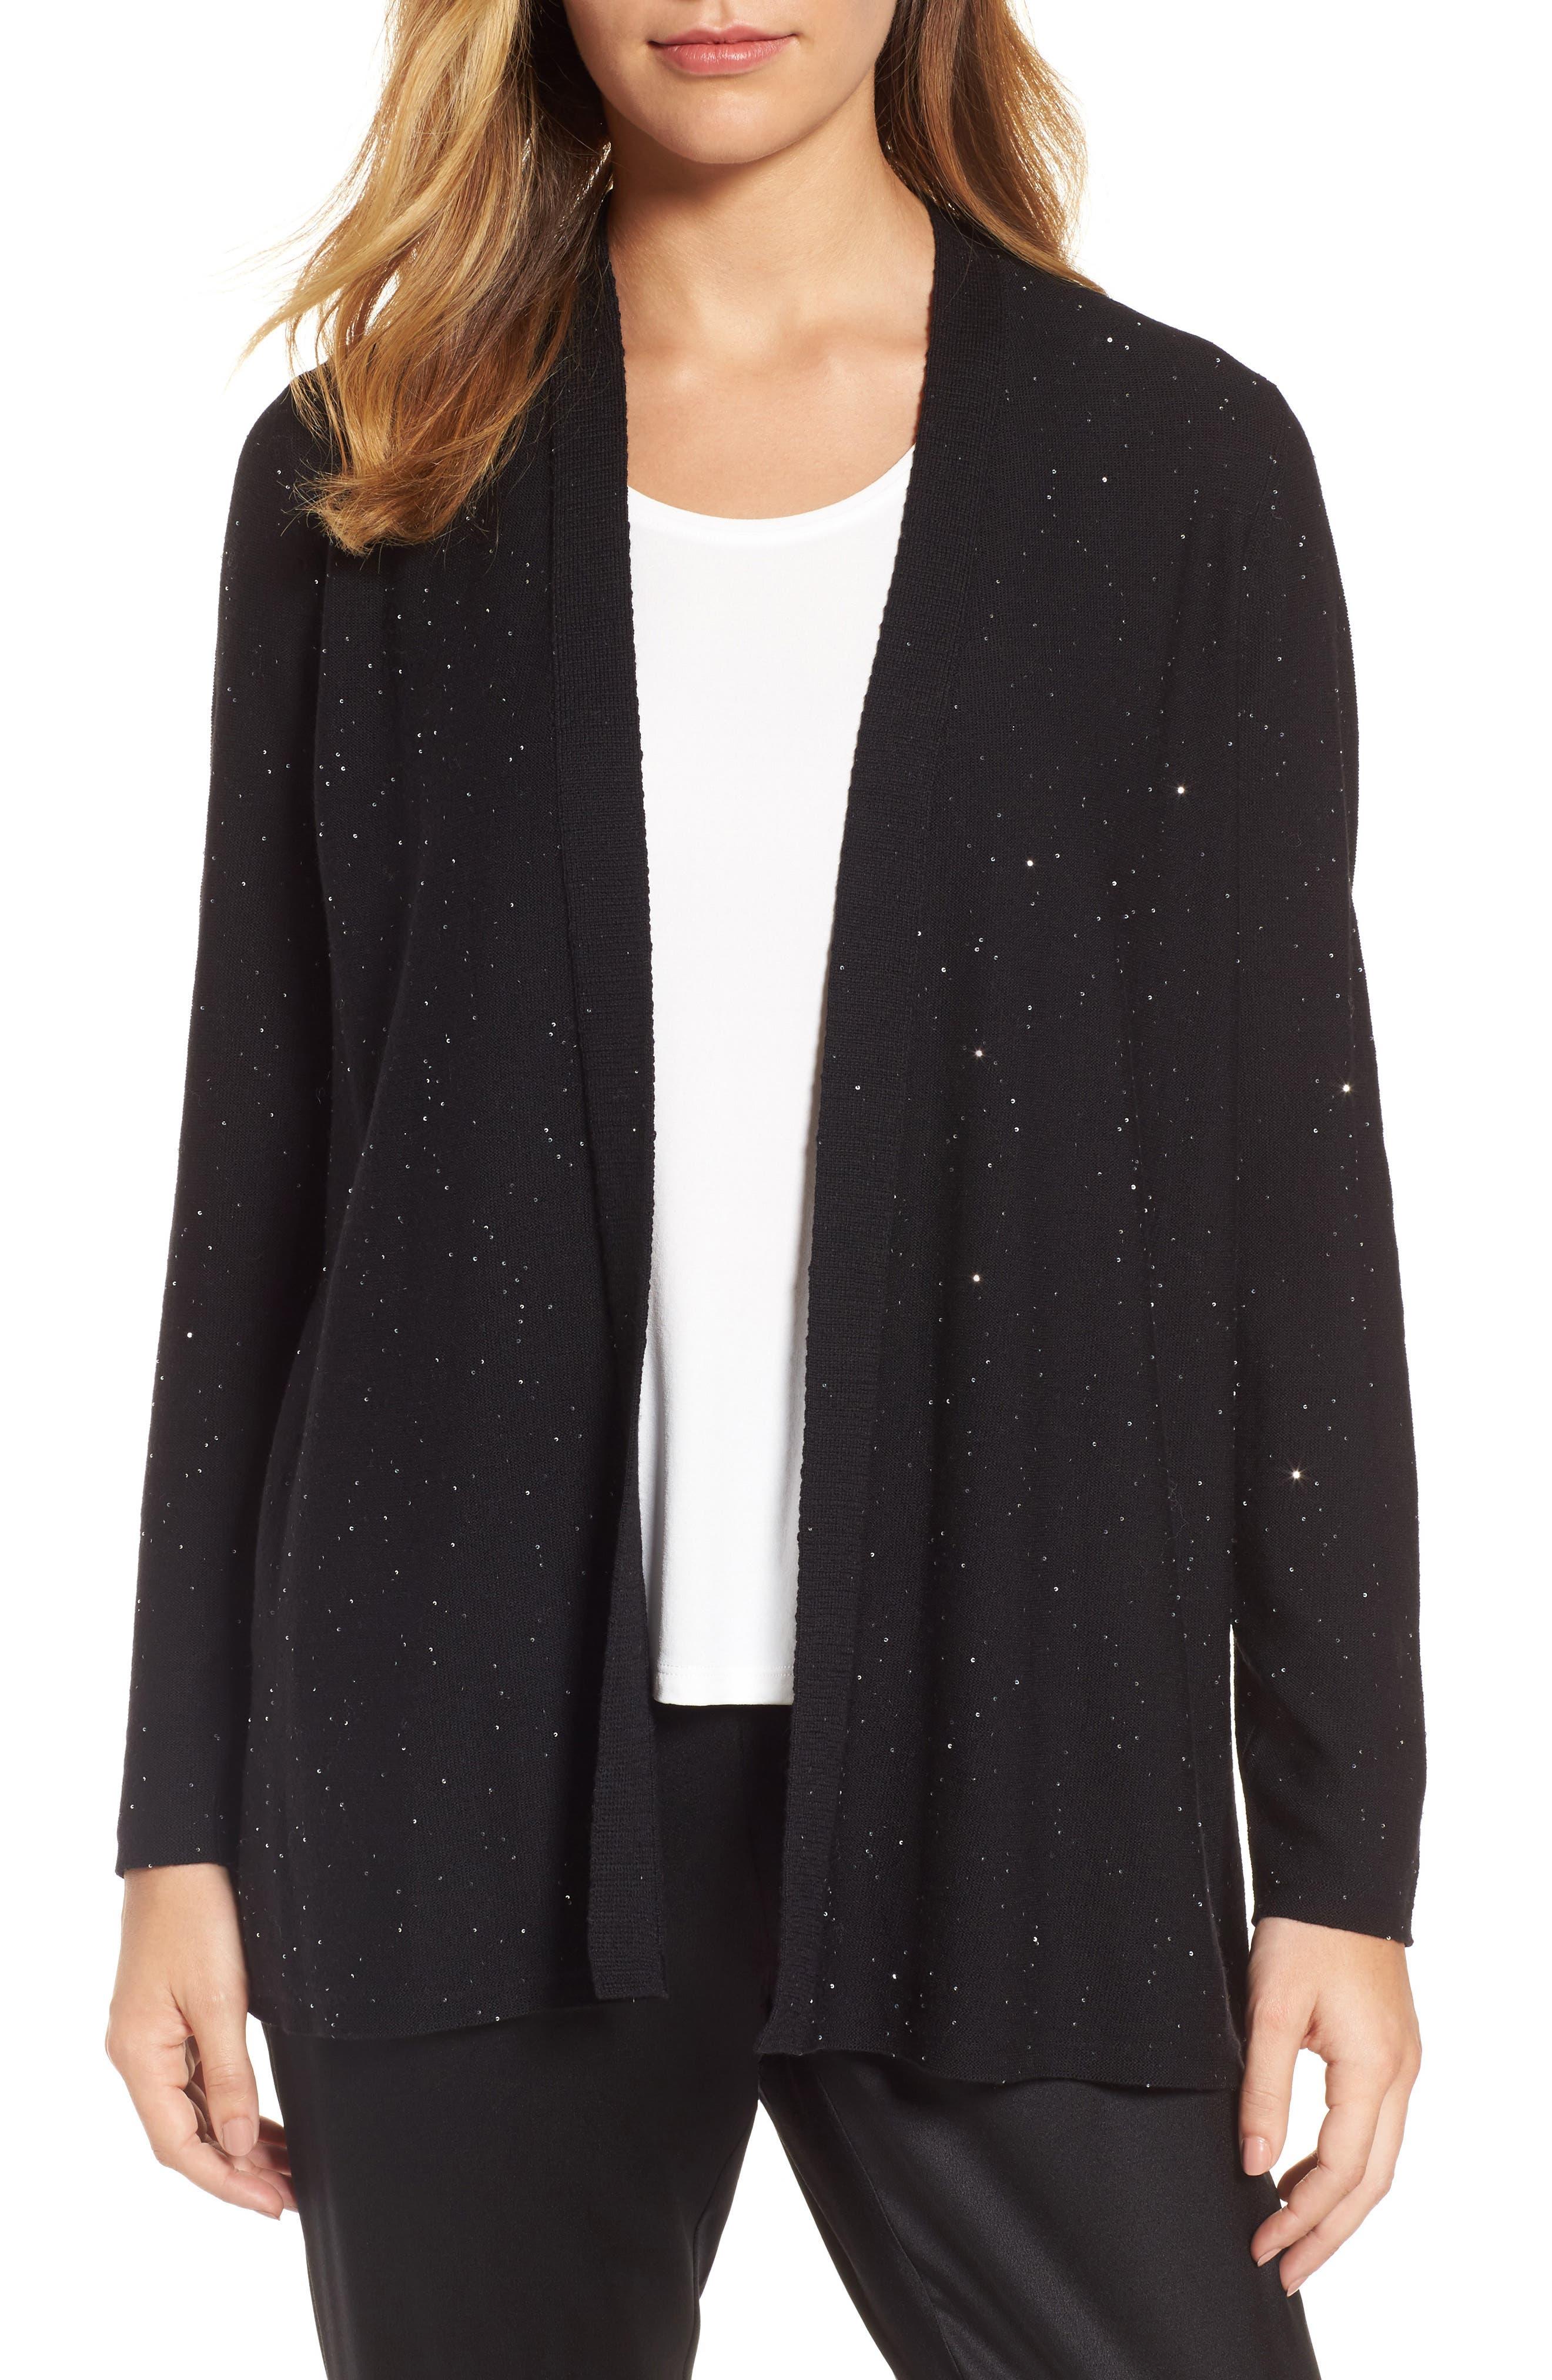 Eileen Fisher Sequin Merino Wool Cardigan (Regular & Petite)